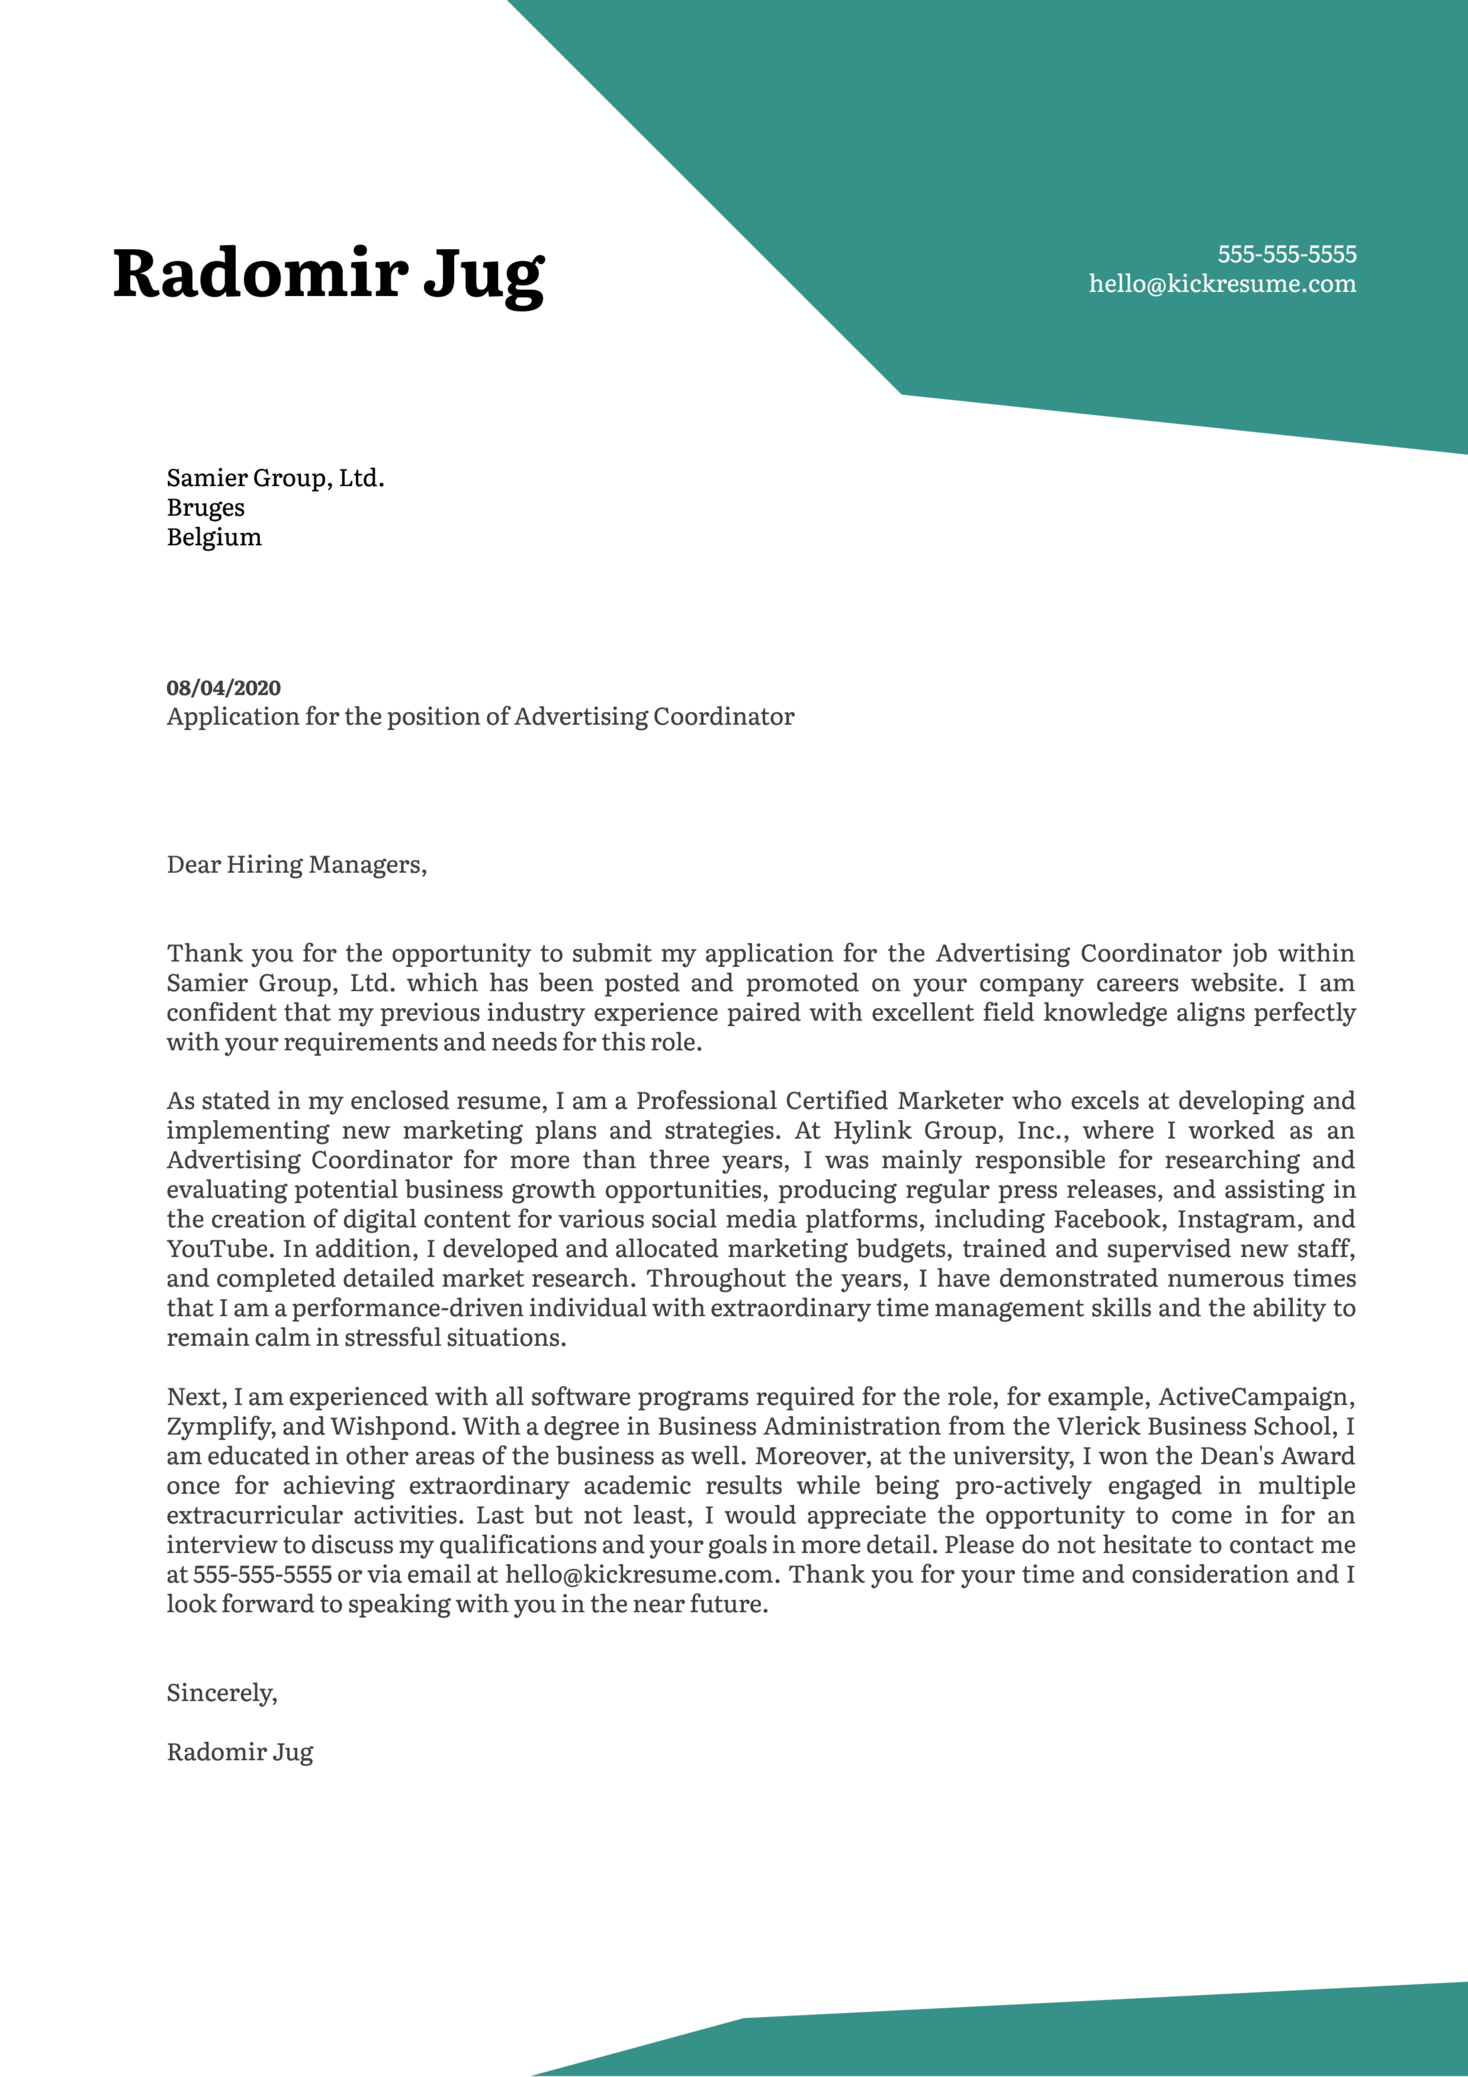 Advertising Coordinator Cover Letter Sample